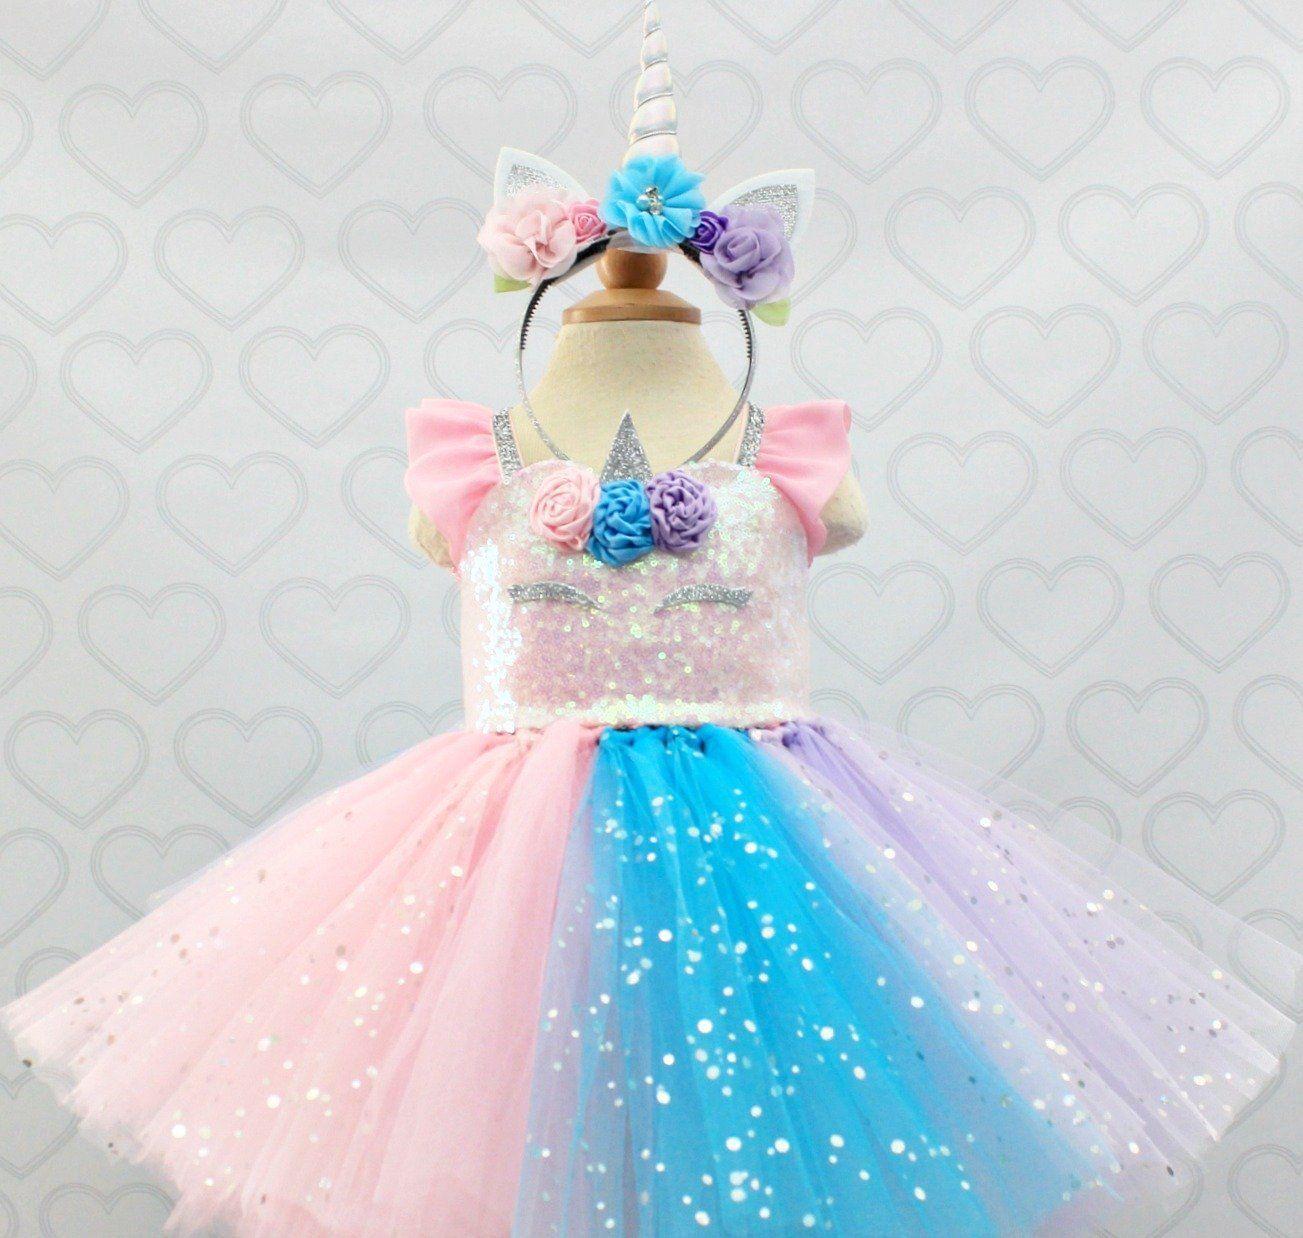 c761d2355 Unicorn dress-unicorn tutu dress-unicorn birthday dress-unicorn tutu-unicorn  outfit-Sparkle